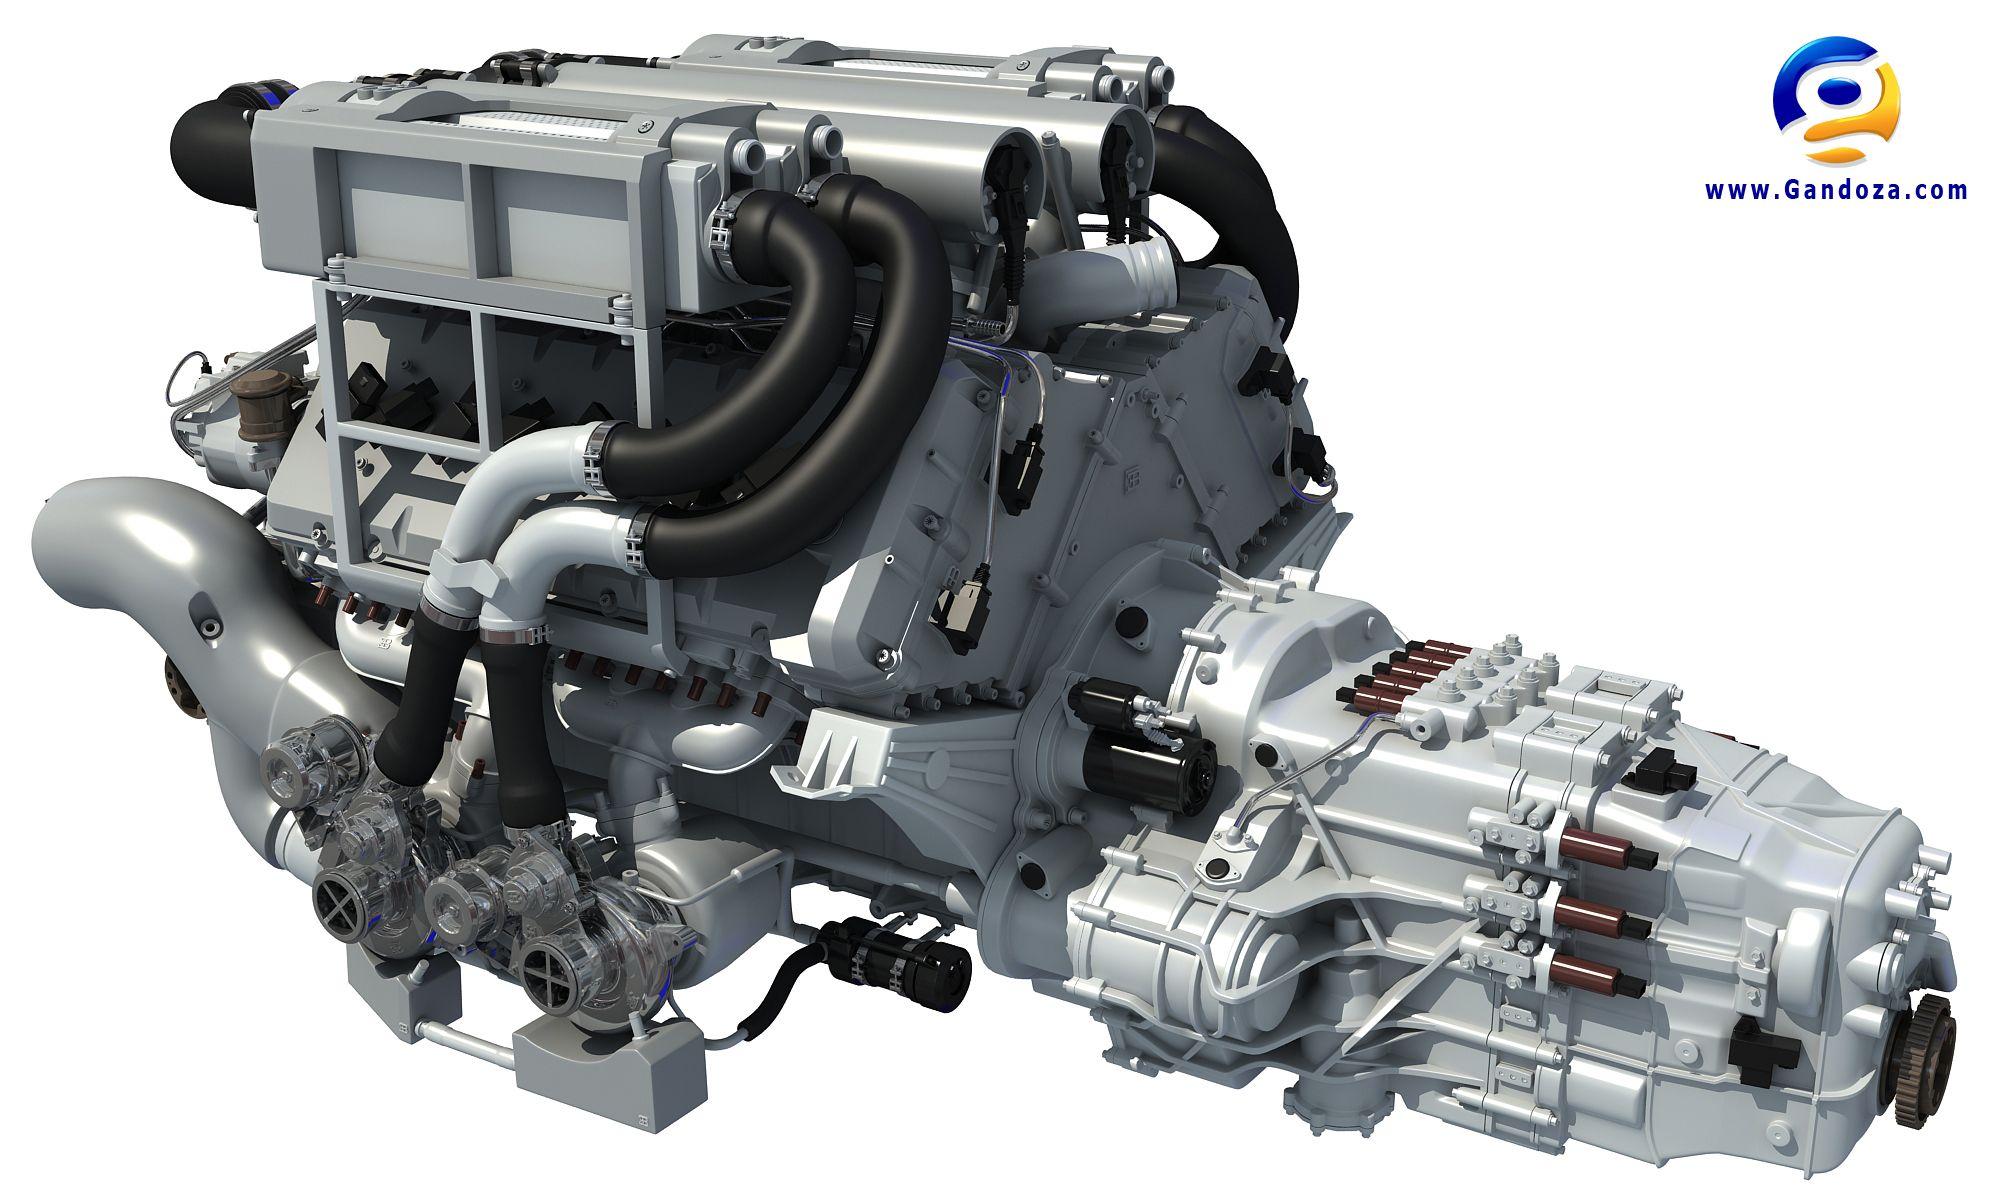 4aed564f95c2f2b7b56afb78ad964f00 Cozy Bugatti Veyron W16 Engine Price Cars Trend